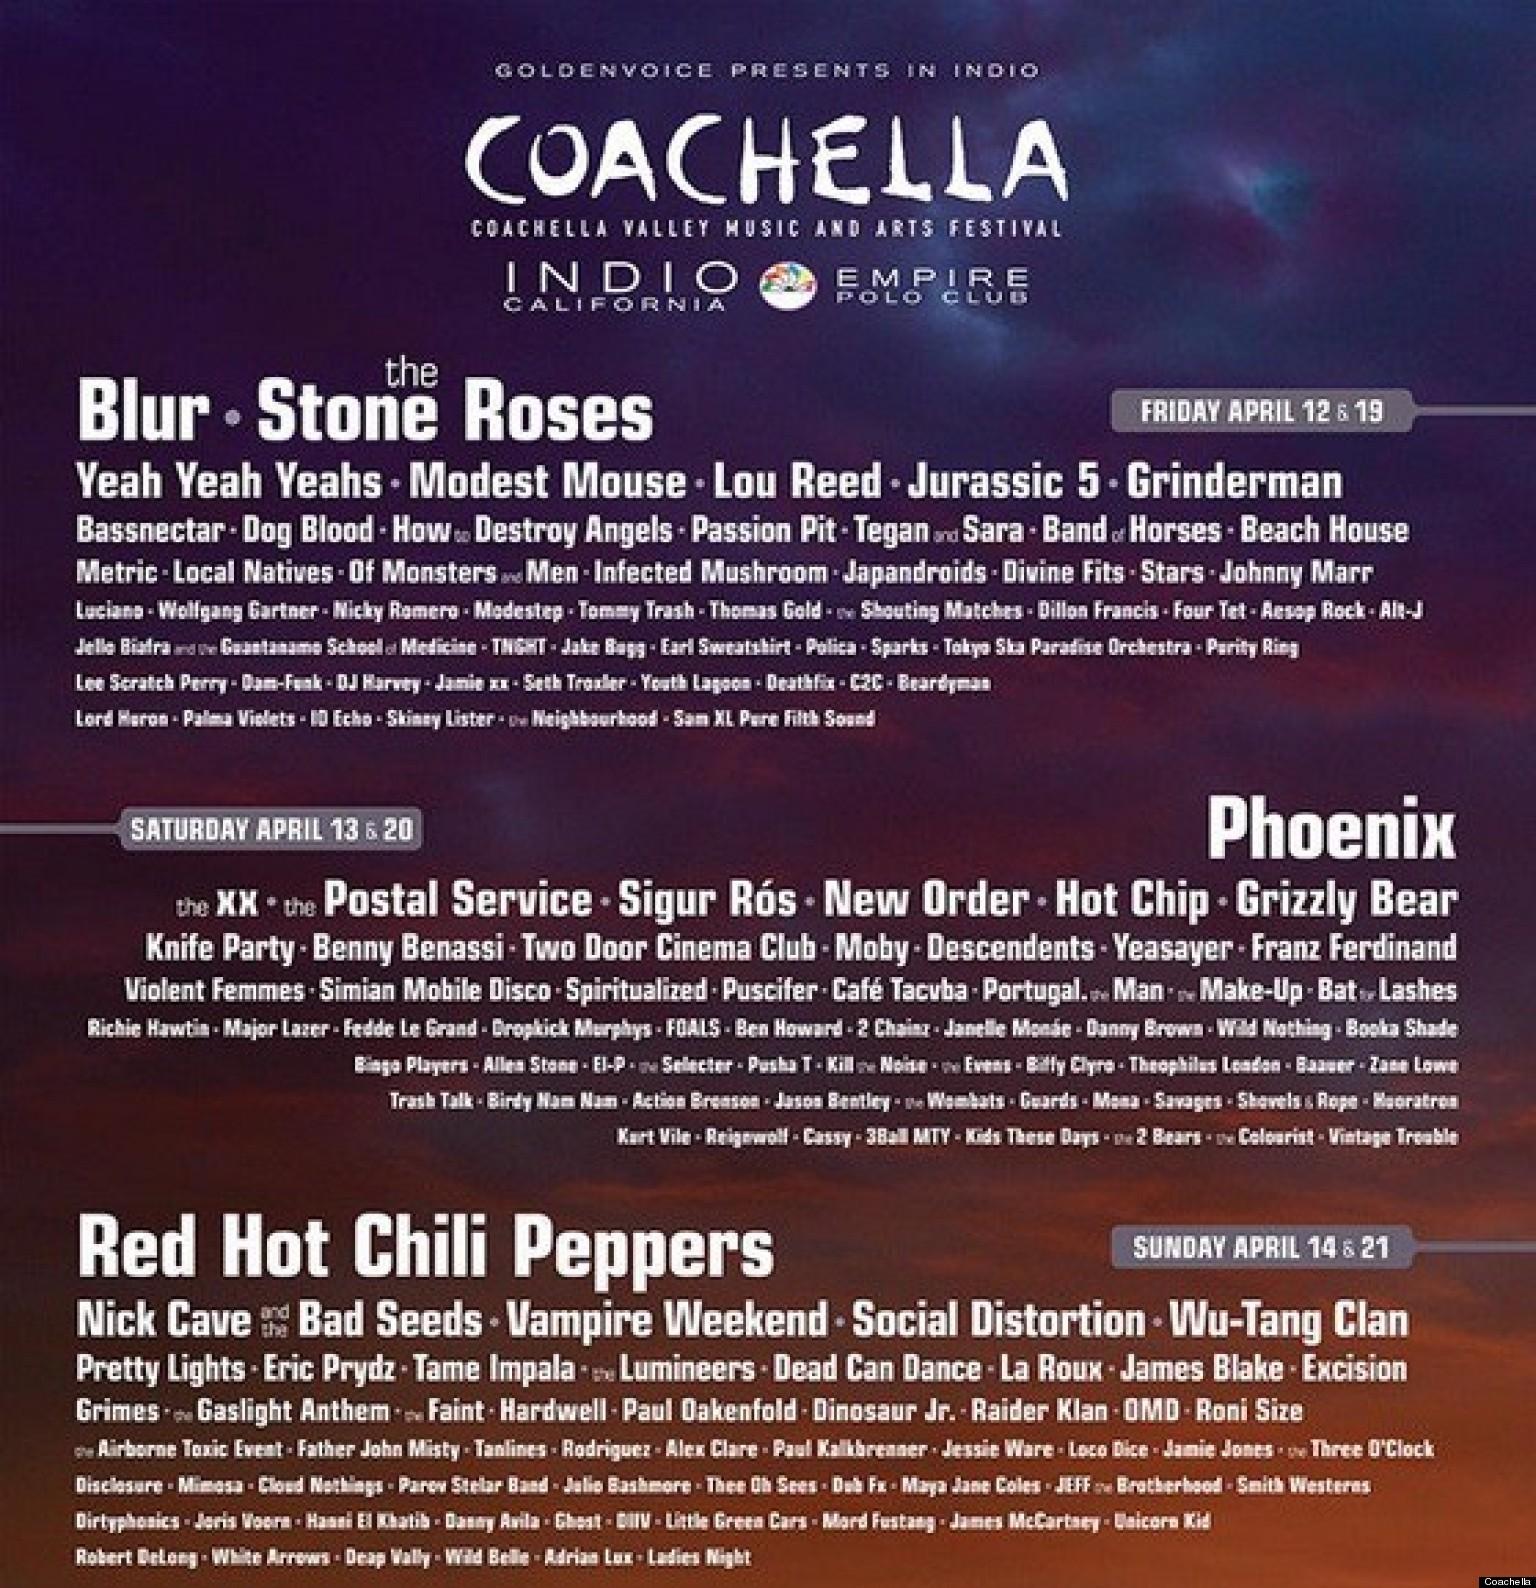 Coachella 2013 Lineup Announced: Blur, The Stone Roses